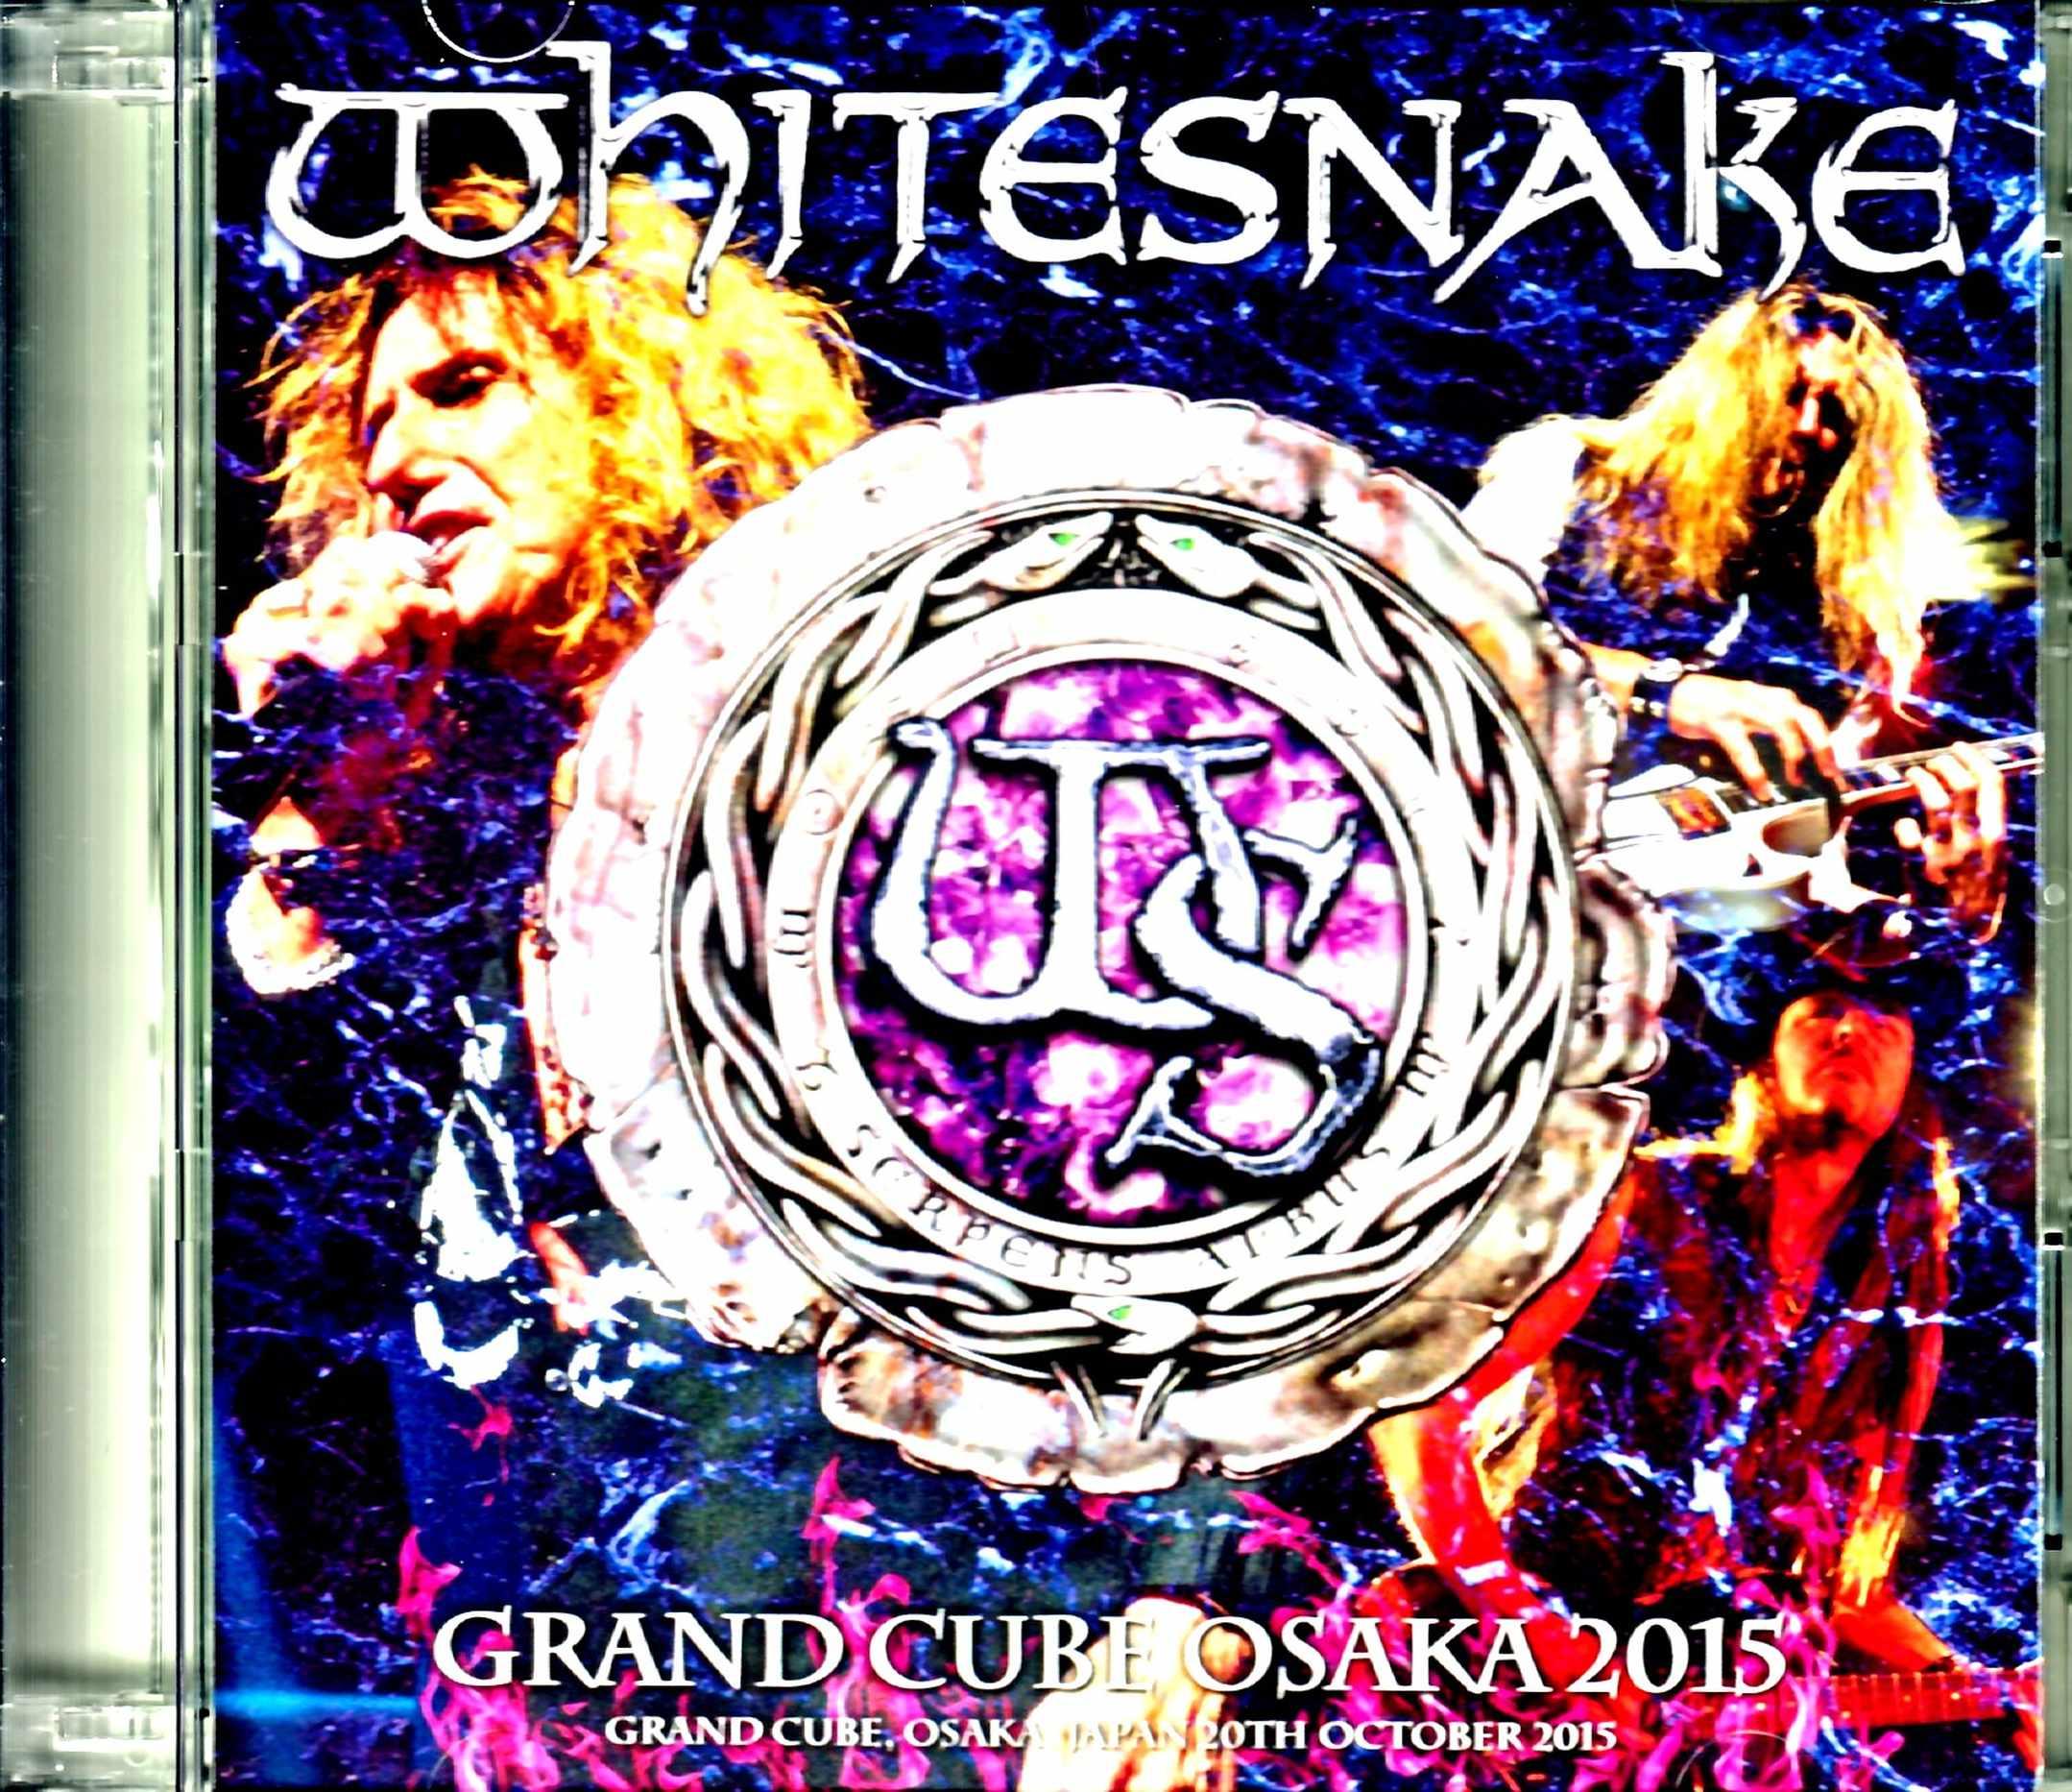 Whitesnake ホワイトスネイク/Osaka,Japan 10.20.2015